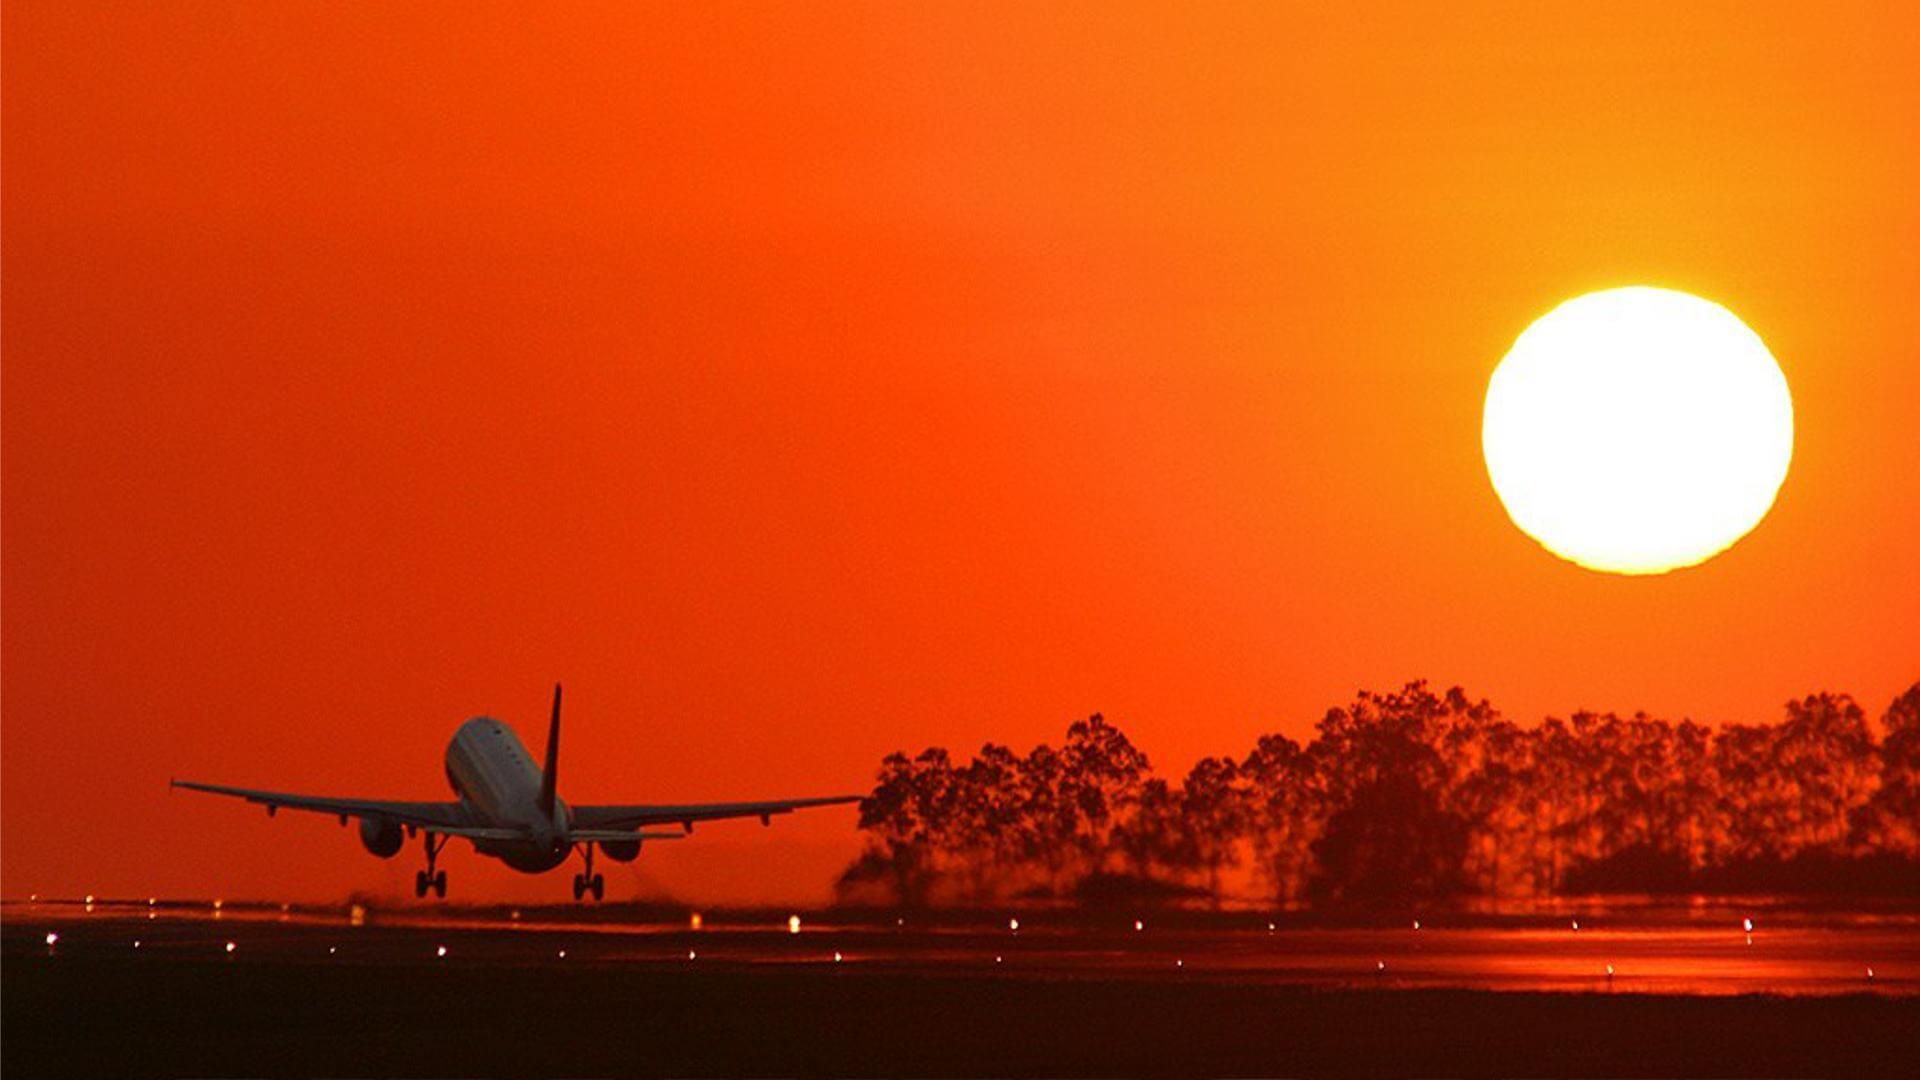 sunset-departure-79935